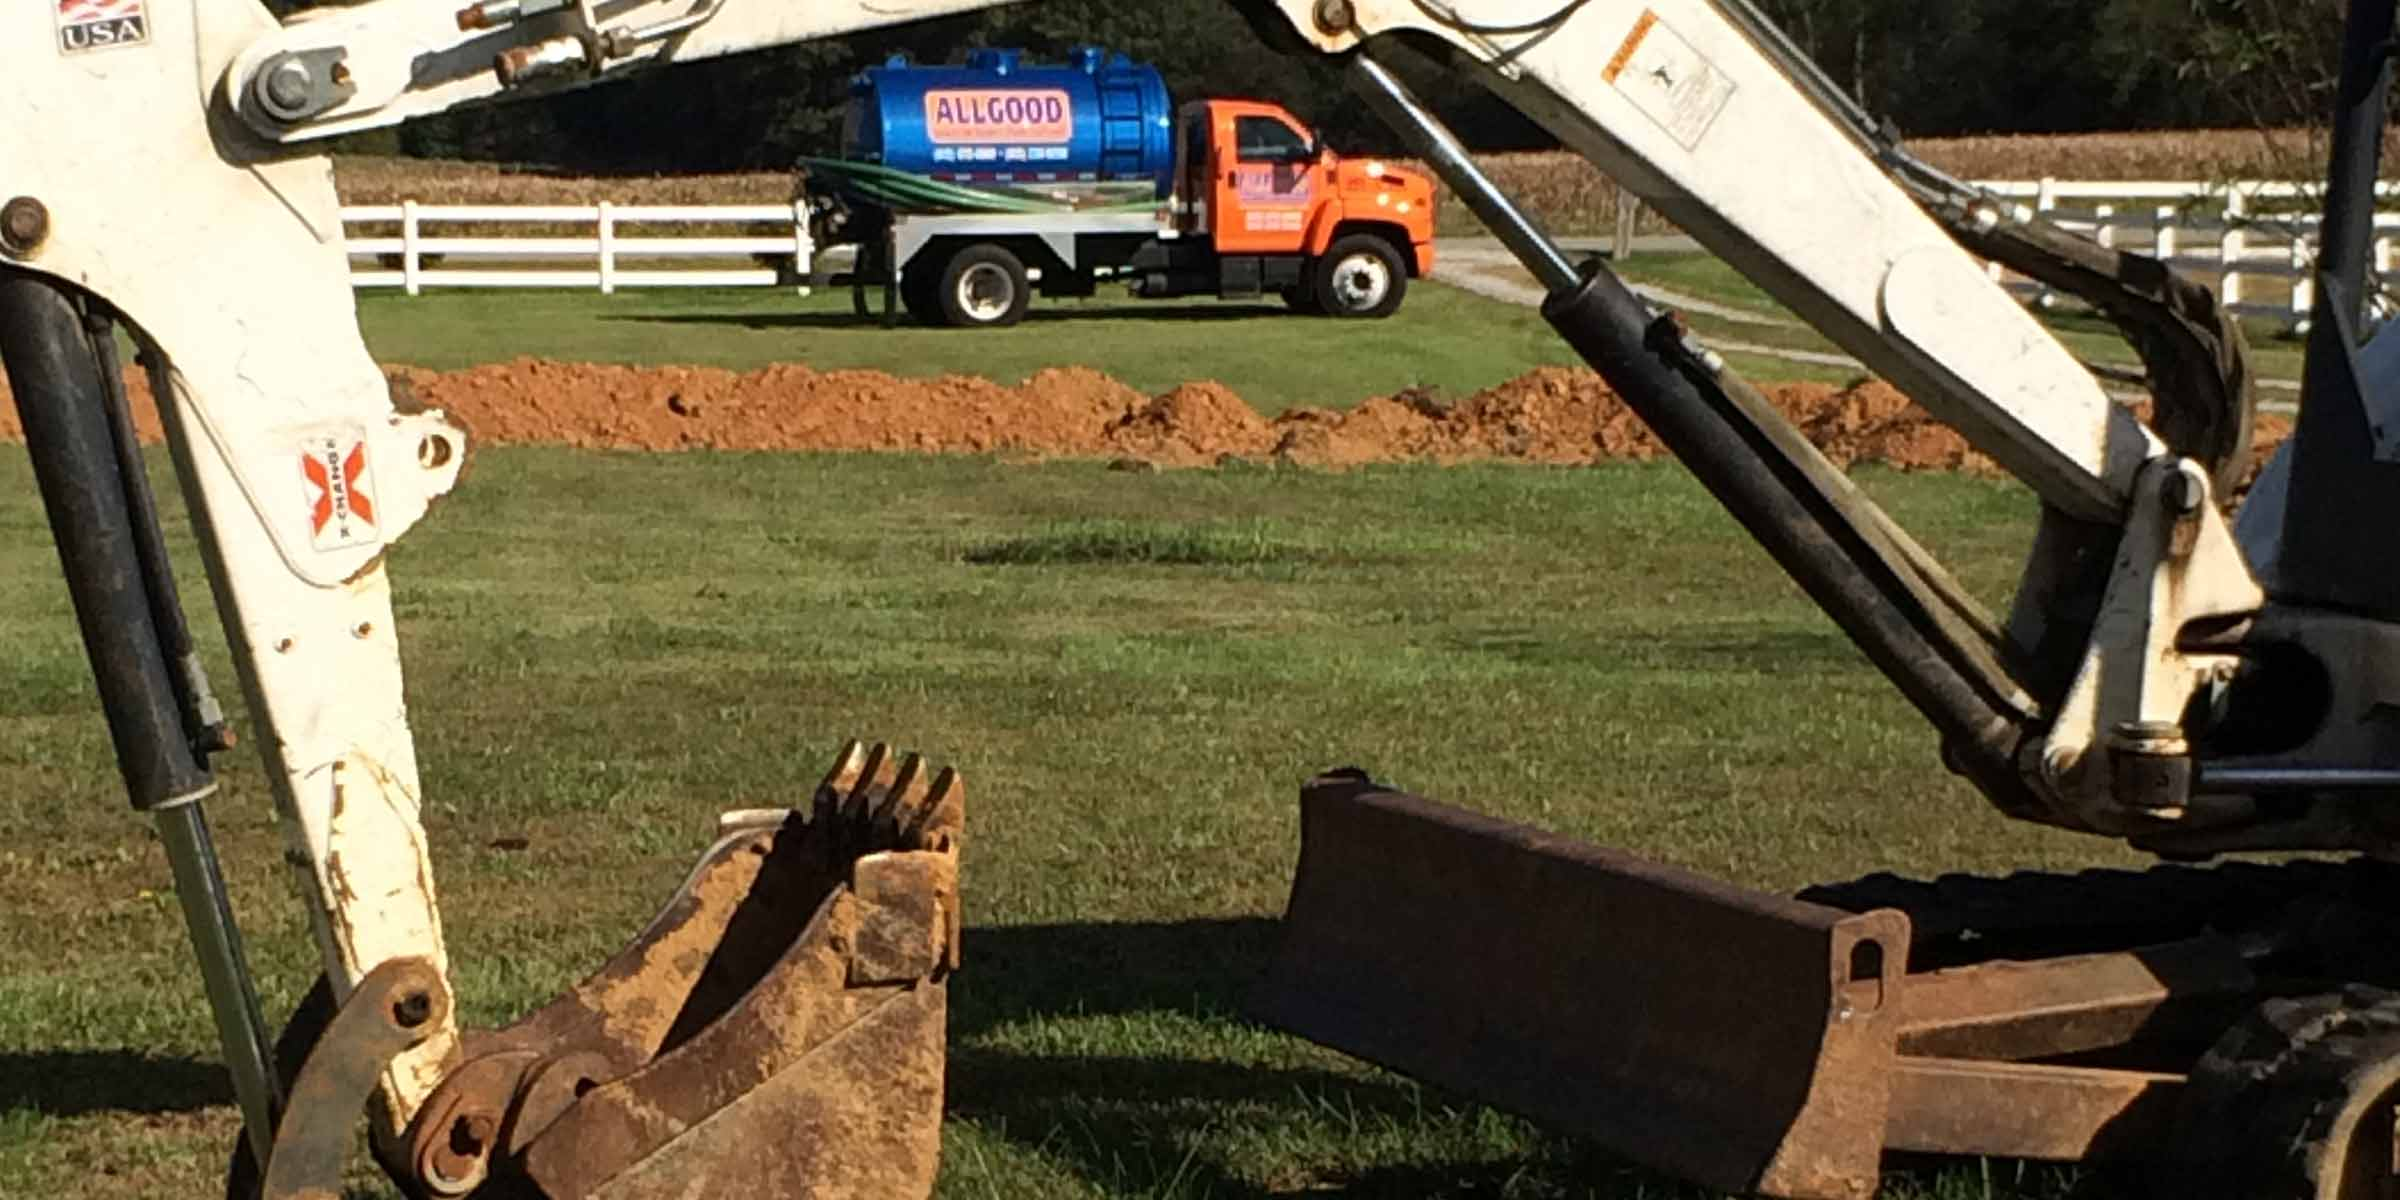 field line repairs by Allgood